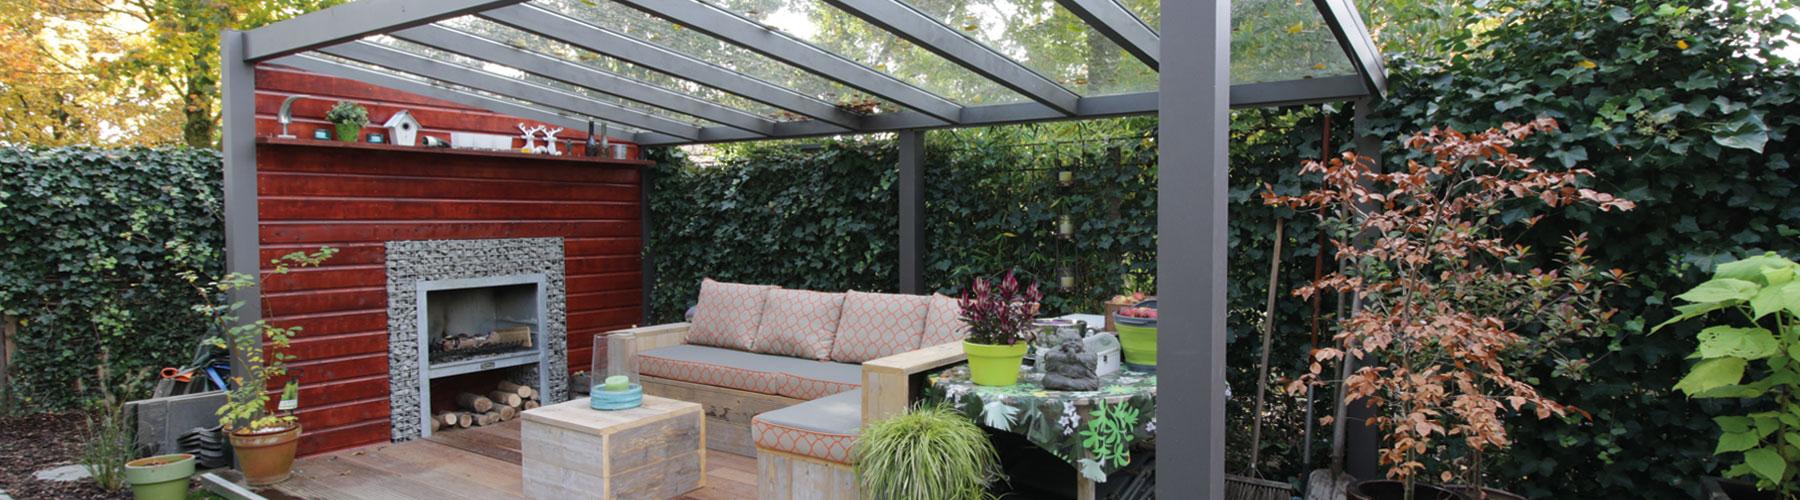 Verasol Lounge Set Antraciet.1800x500x1